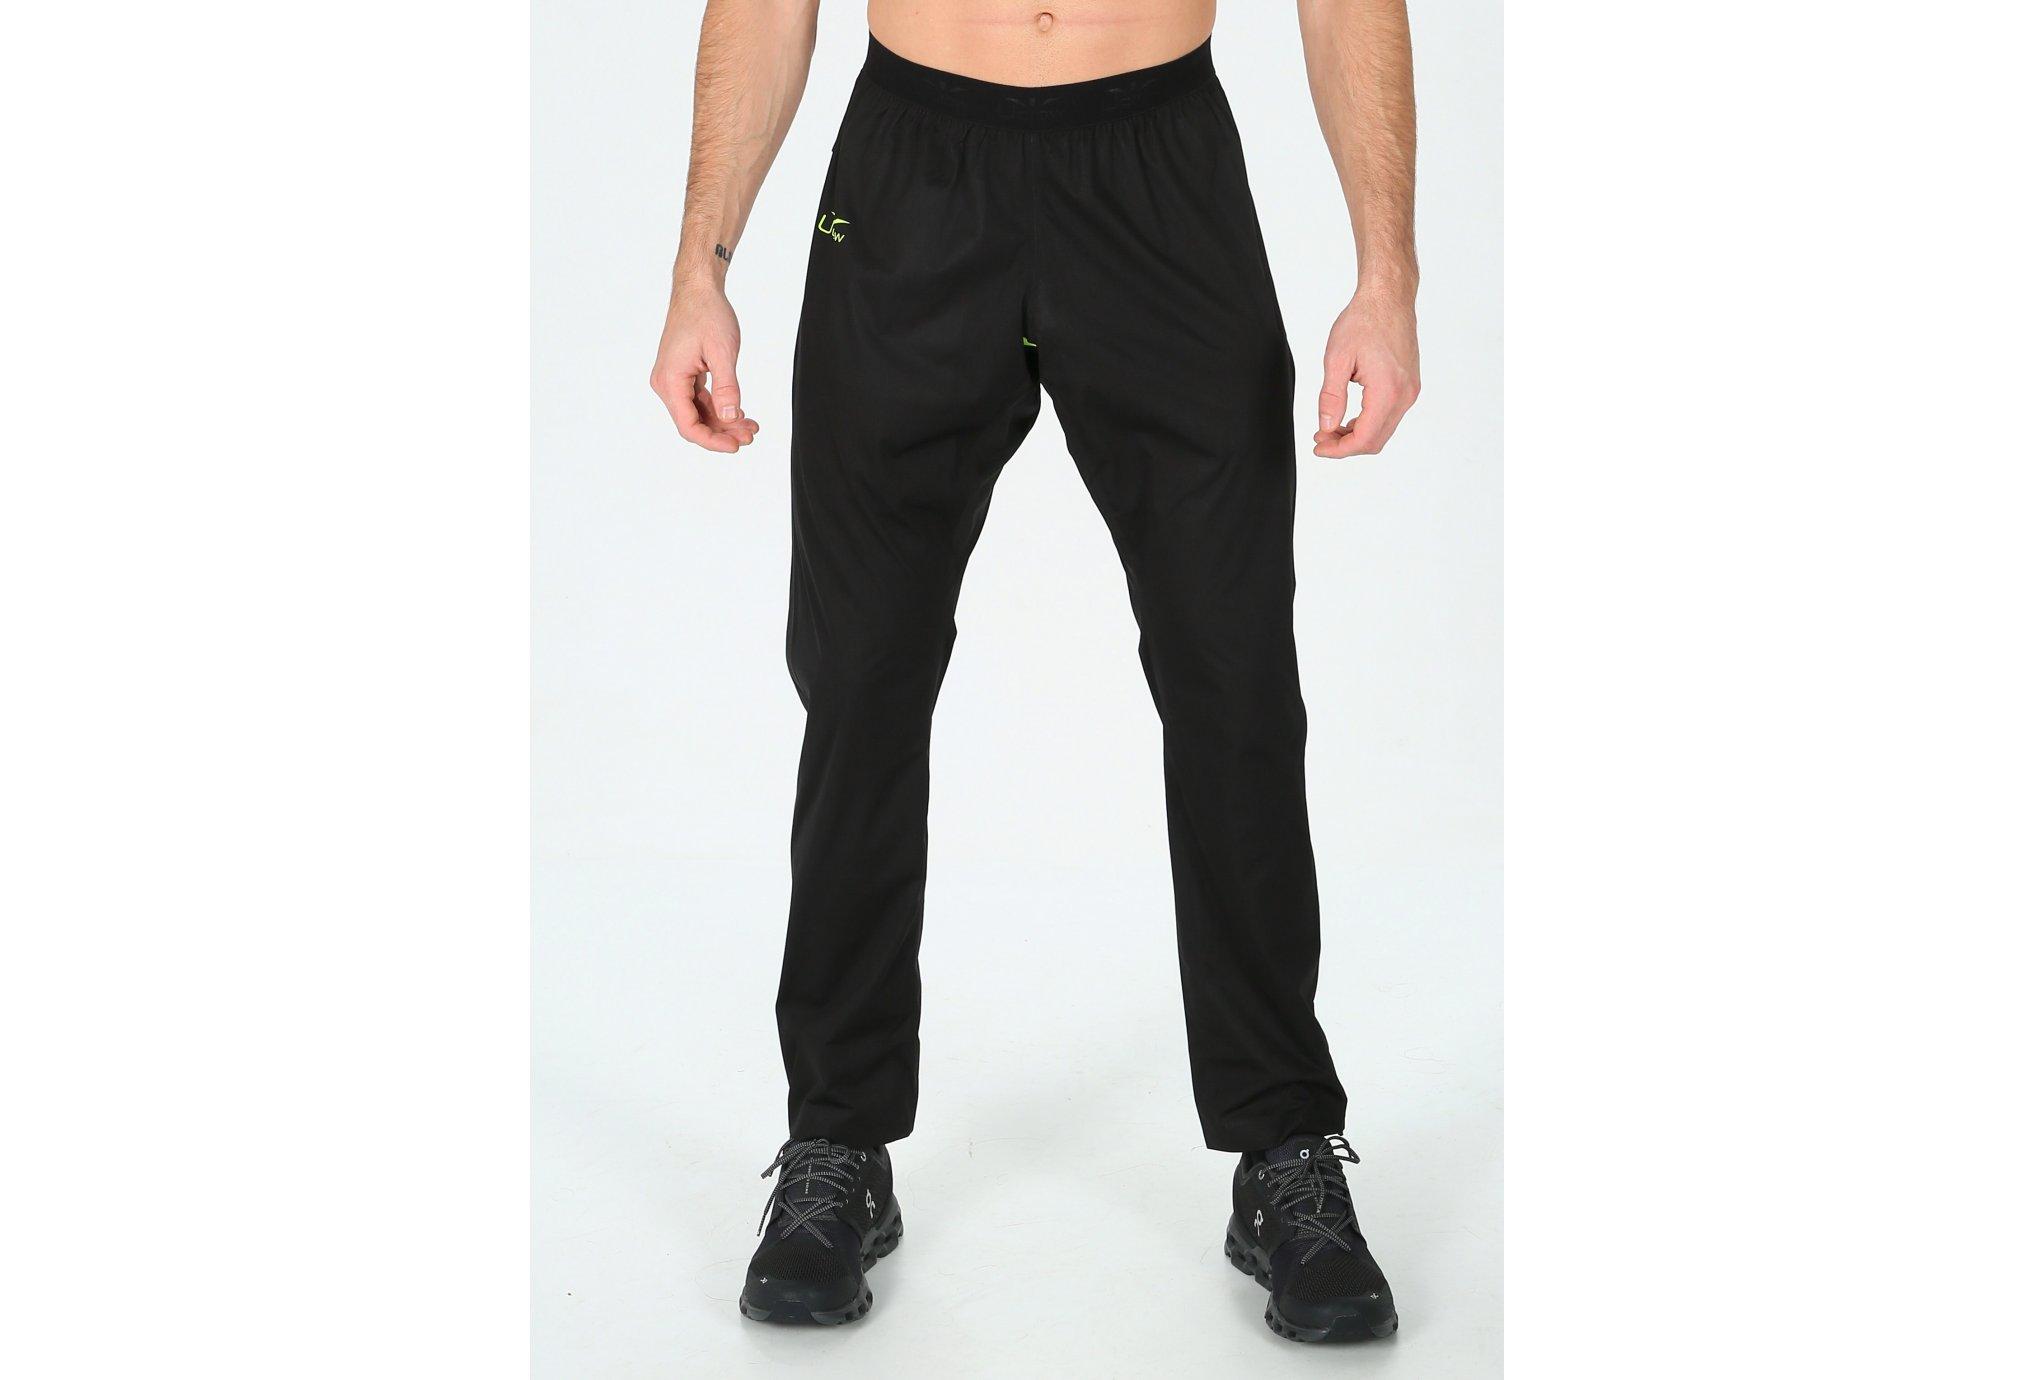 Uglow WP Pant 3.1 vêtement running homme